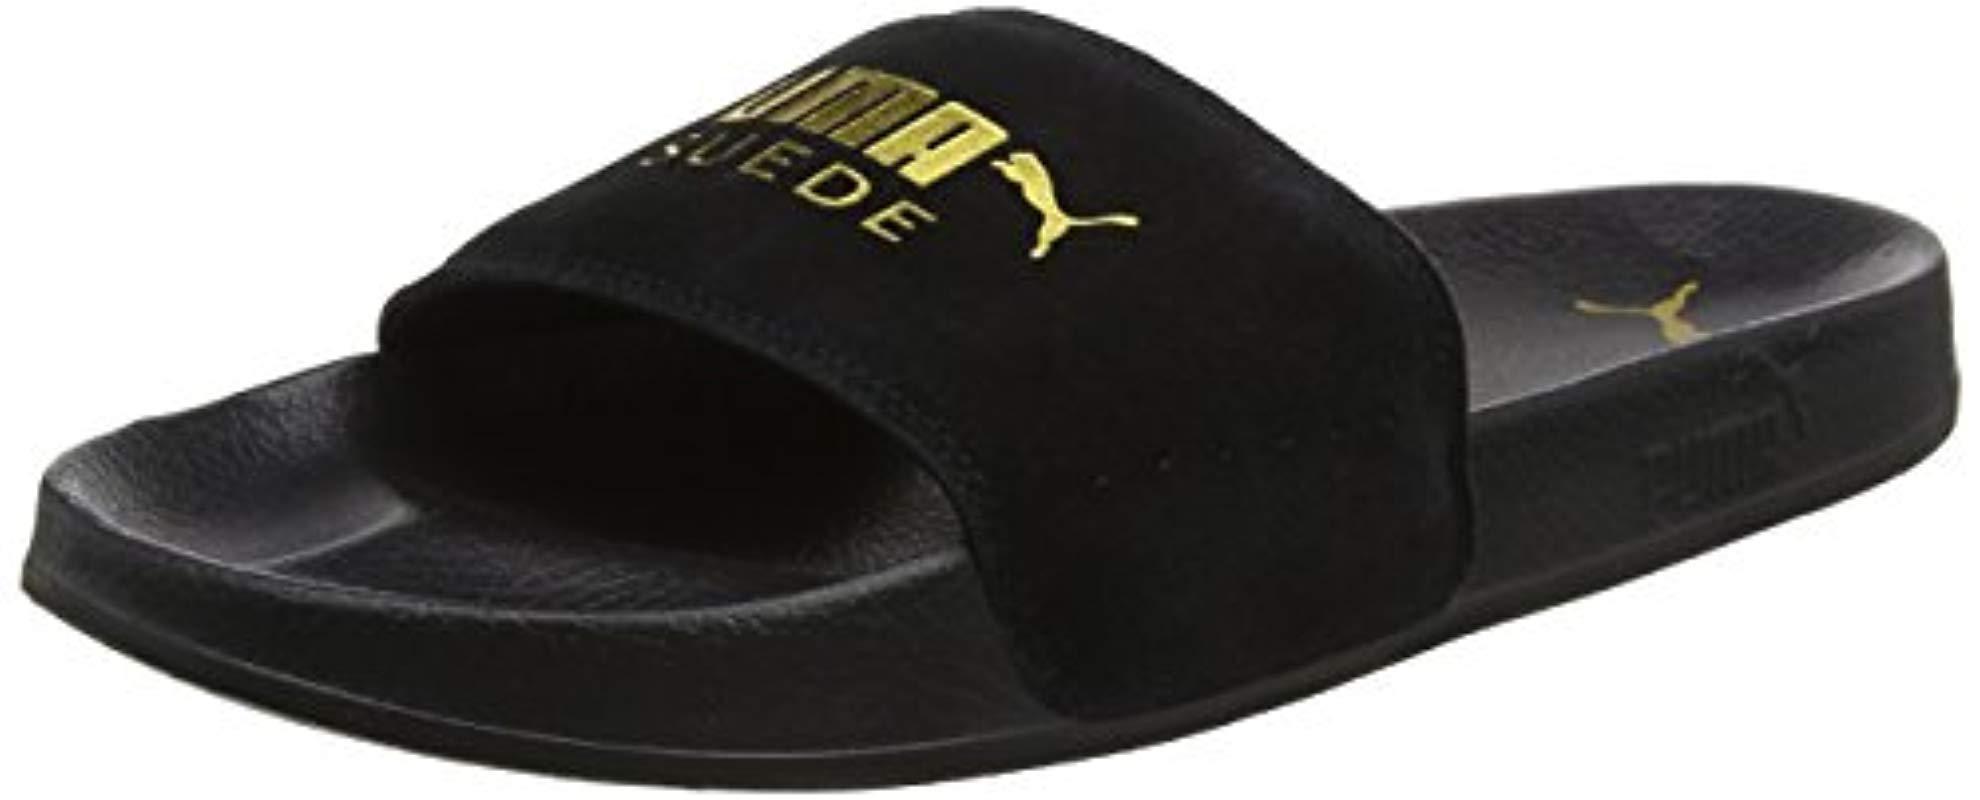 14cc4c8b5d515f Puma Leadcat Suede Slide Sandal in Black for Men - Lyst